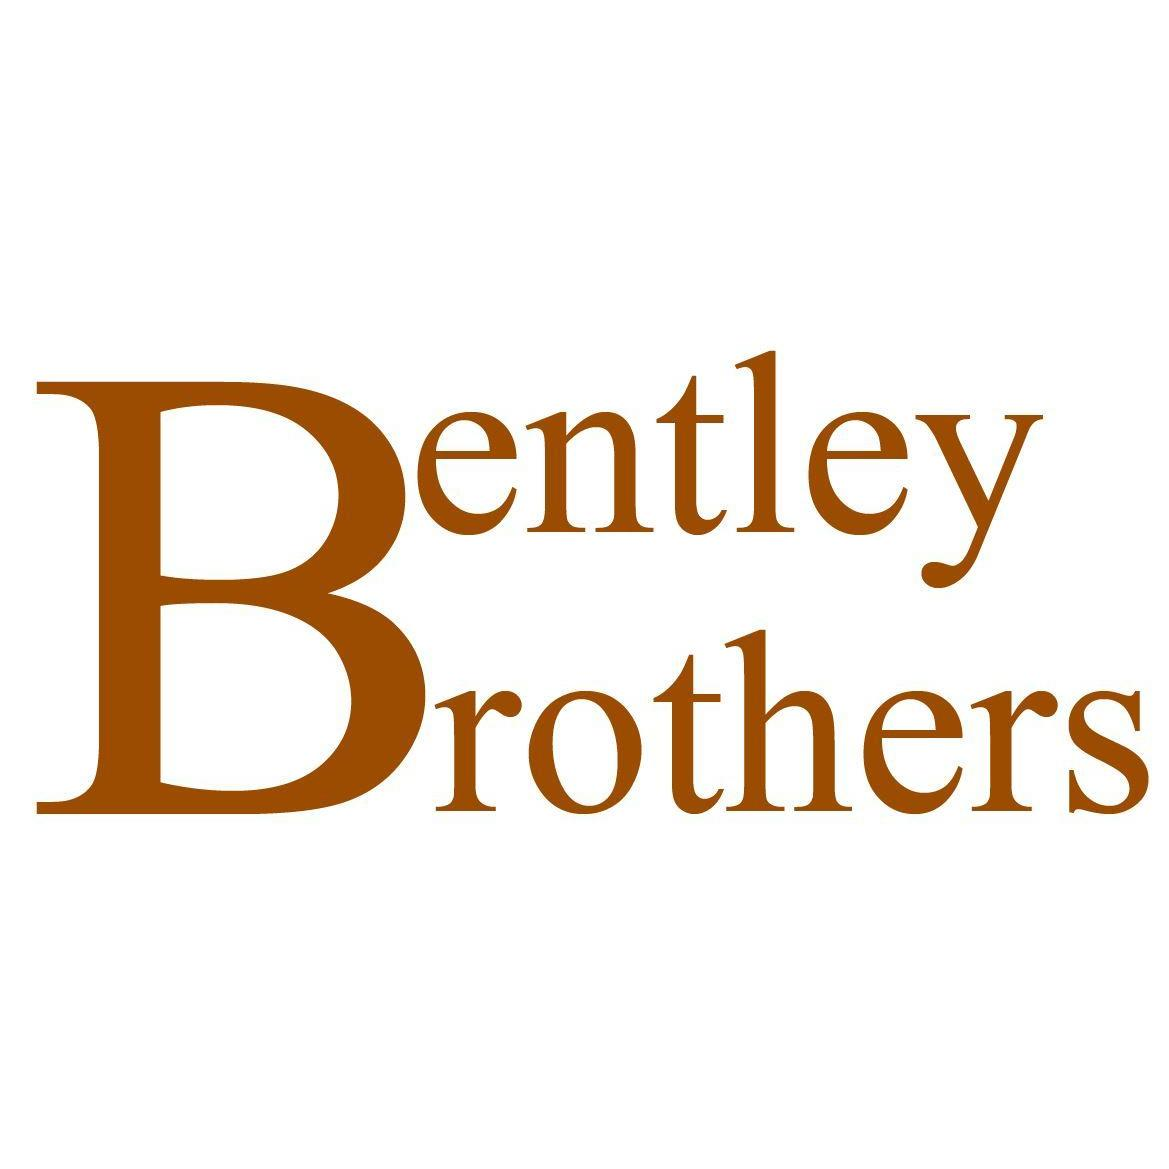 Bentley Bros Sliding Sash Windows Specialist - Pudsey, West Yorkshire LS28 7DY - 01132 361384 | ShowMeLocal.com